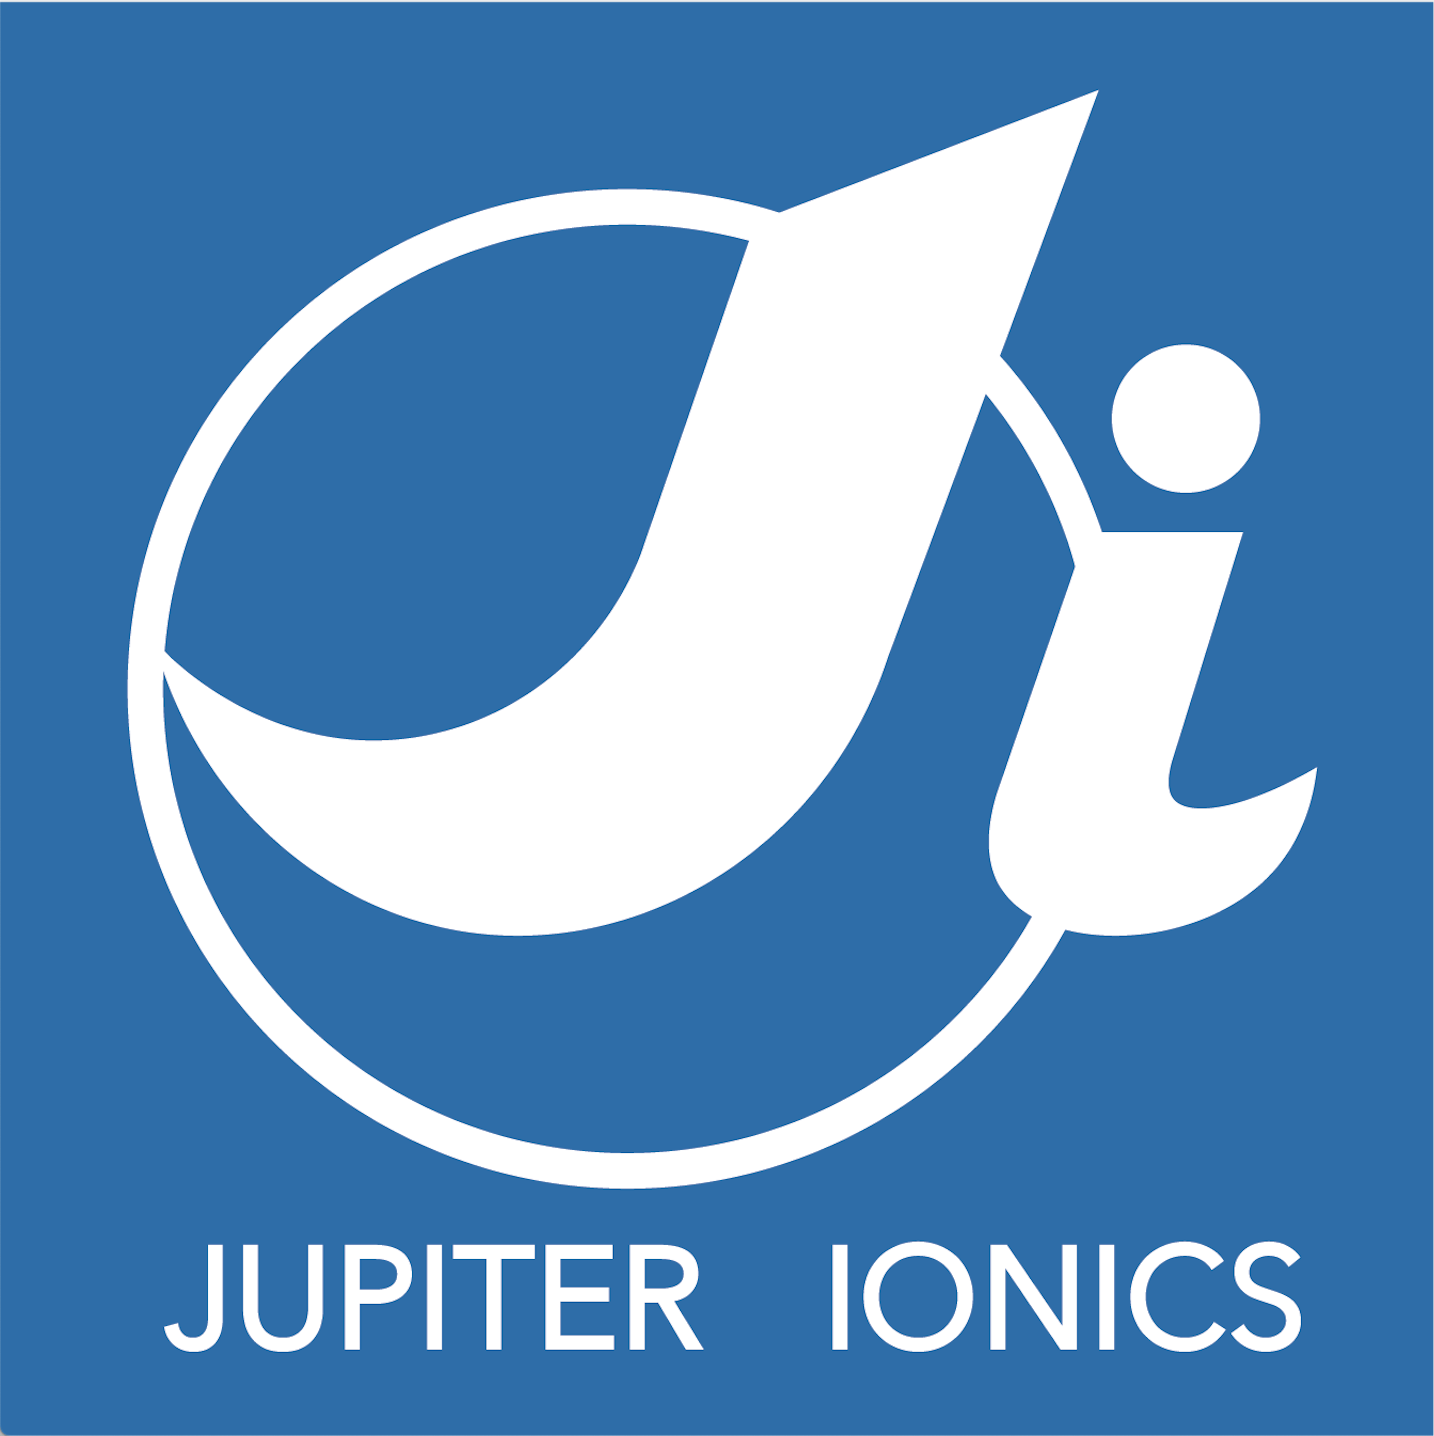 Jupiter Ionics